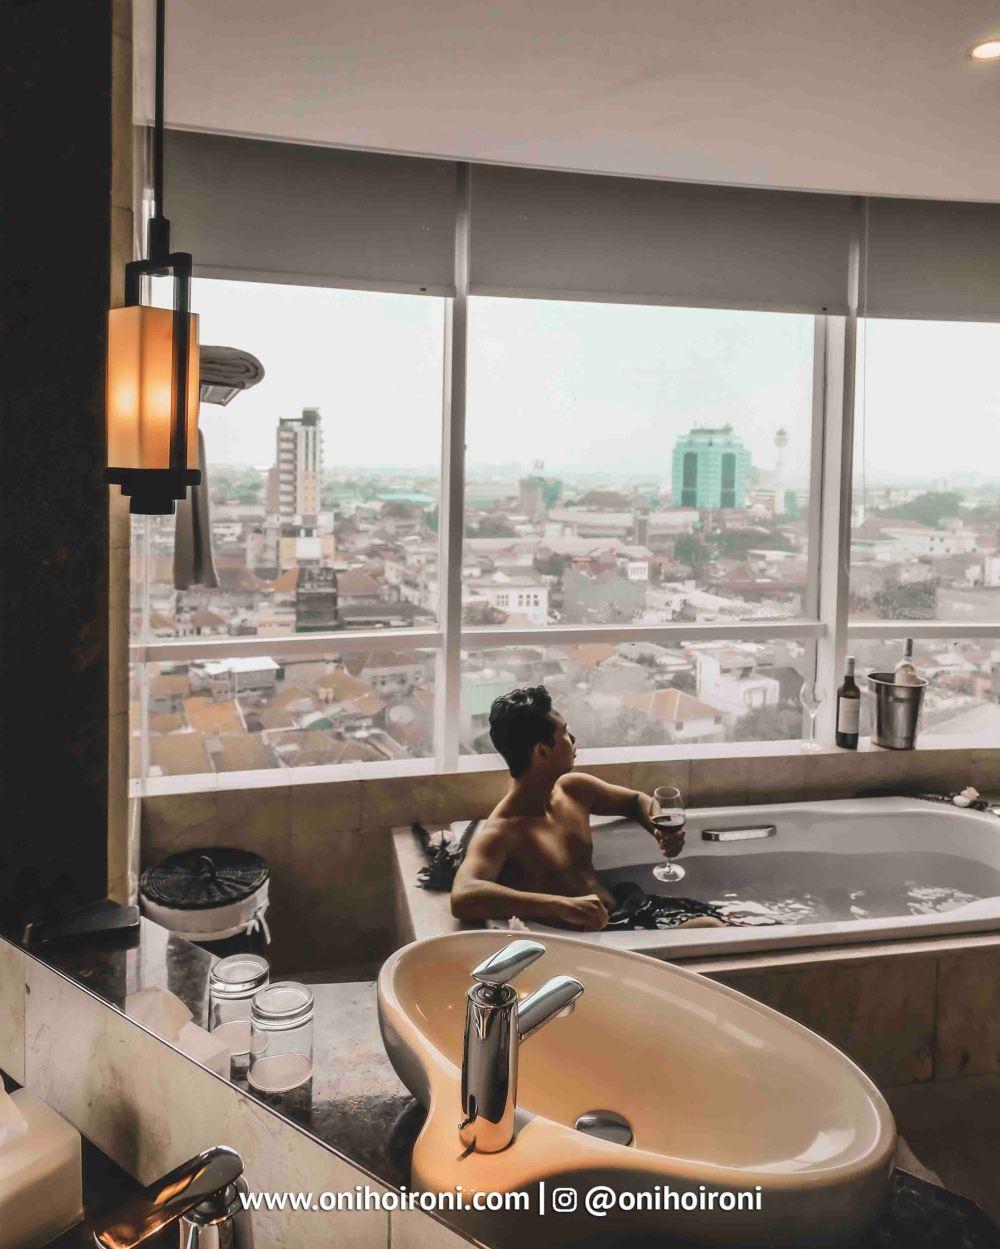 2 Room bathtubCrowne Plaza Bandung Oni Hoironi